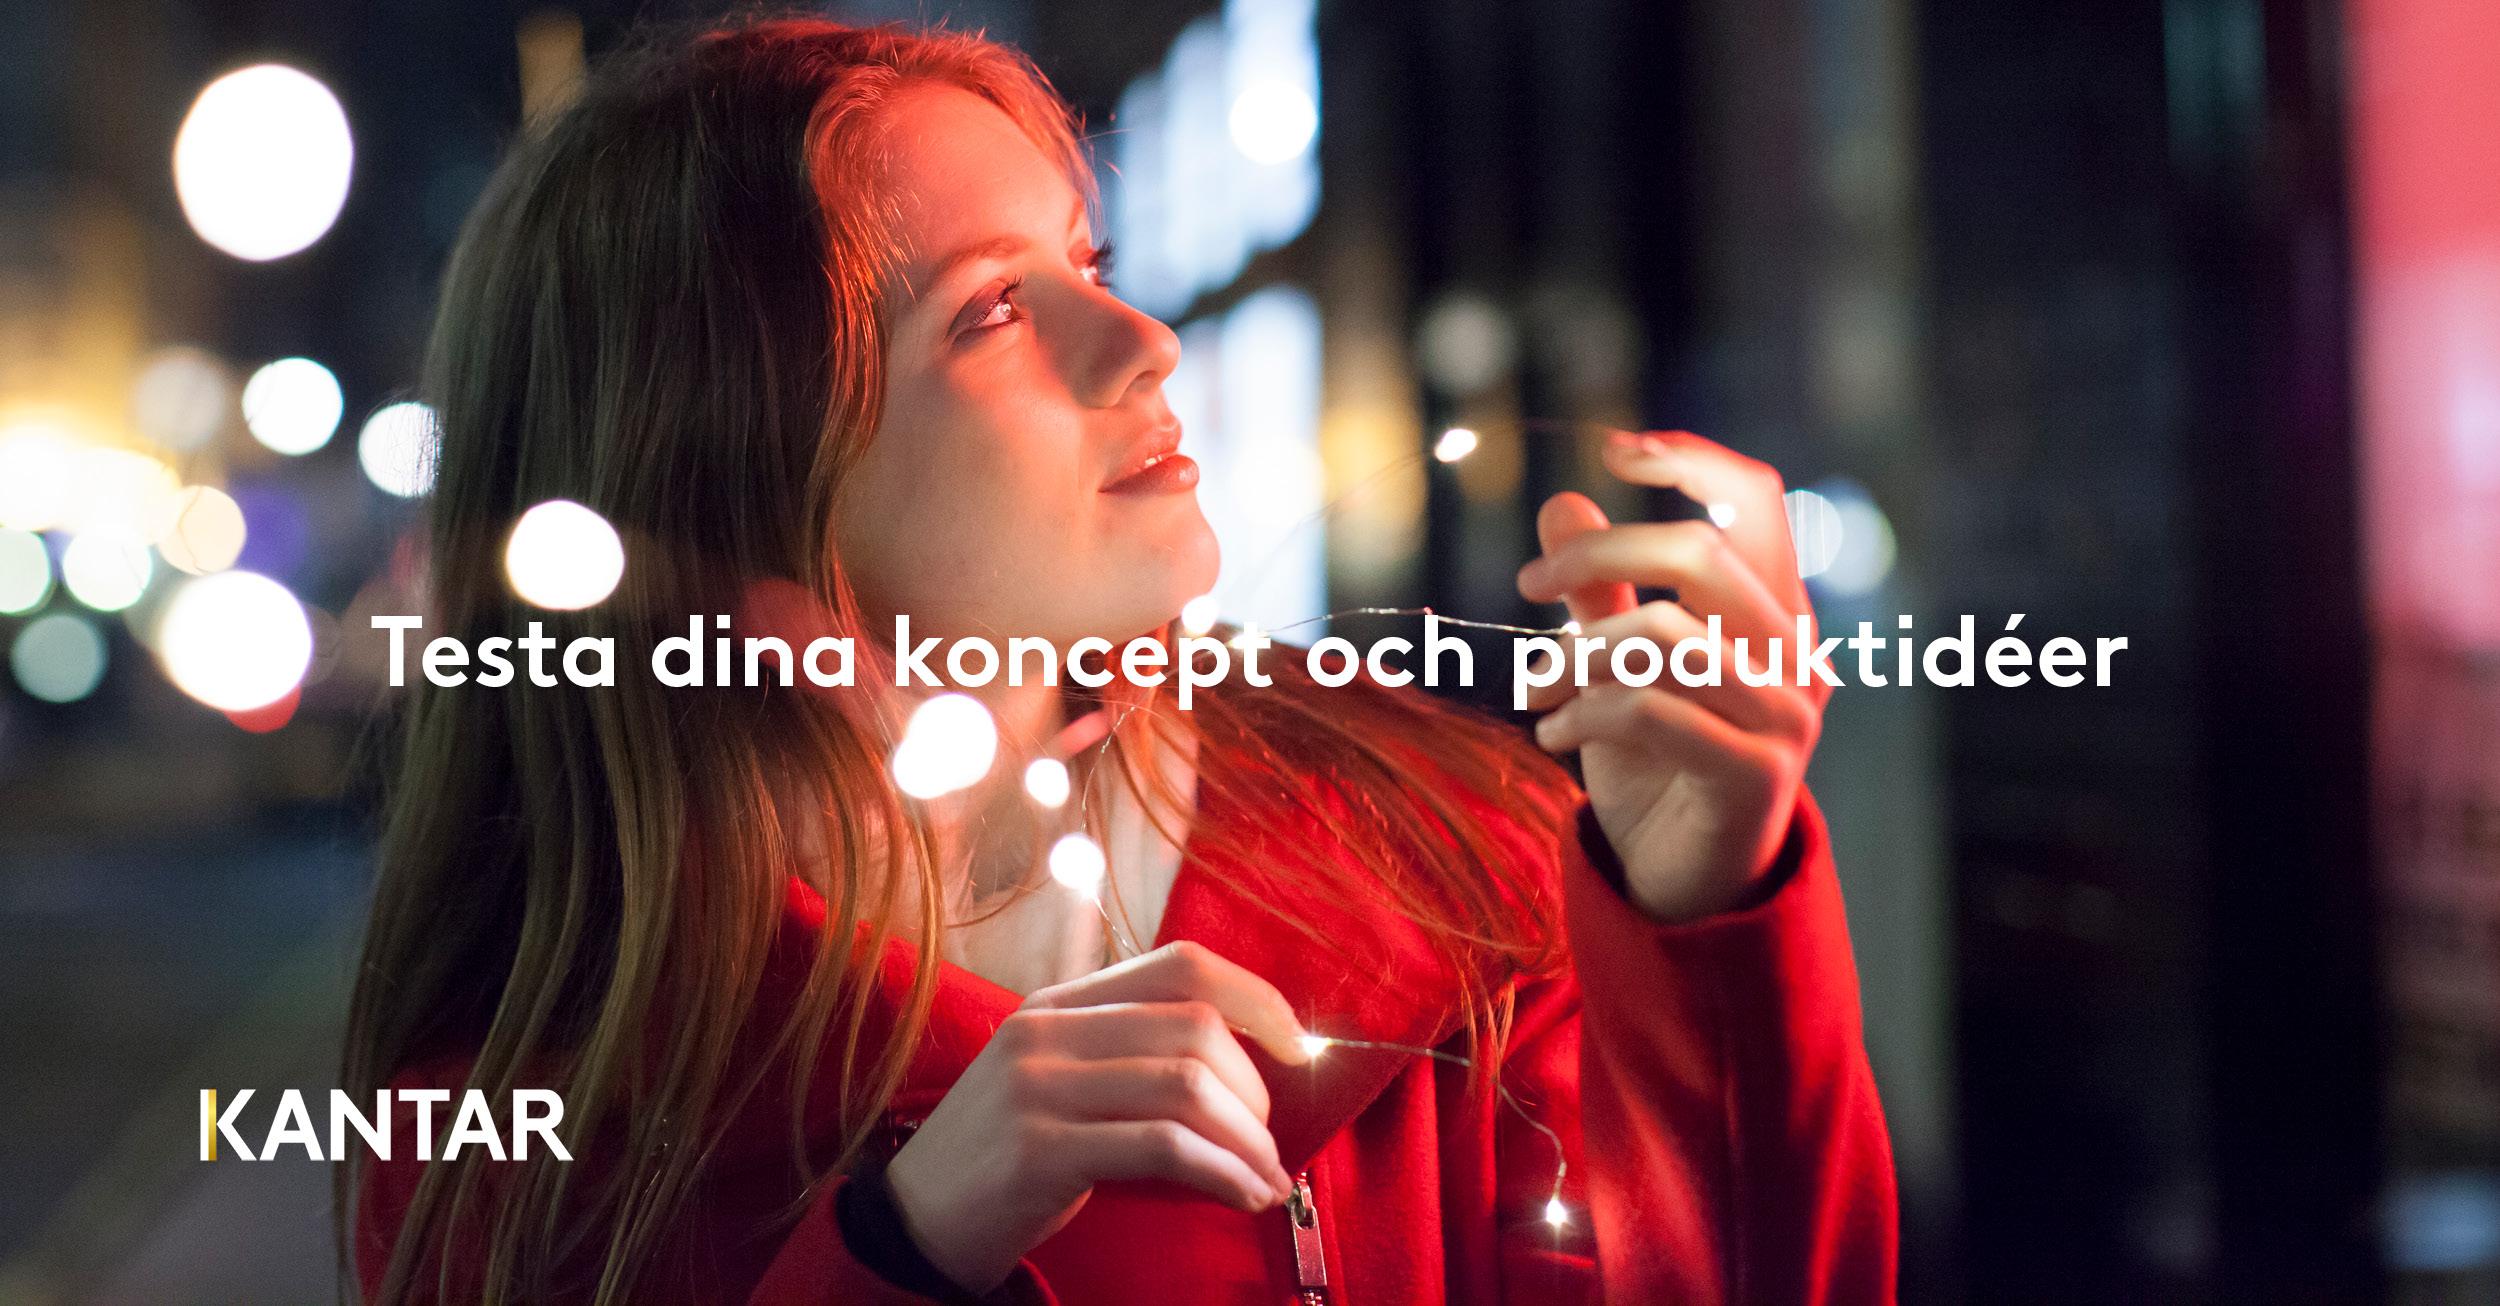 Kantar_koncepttest_LinkedIn